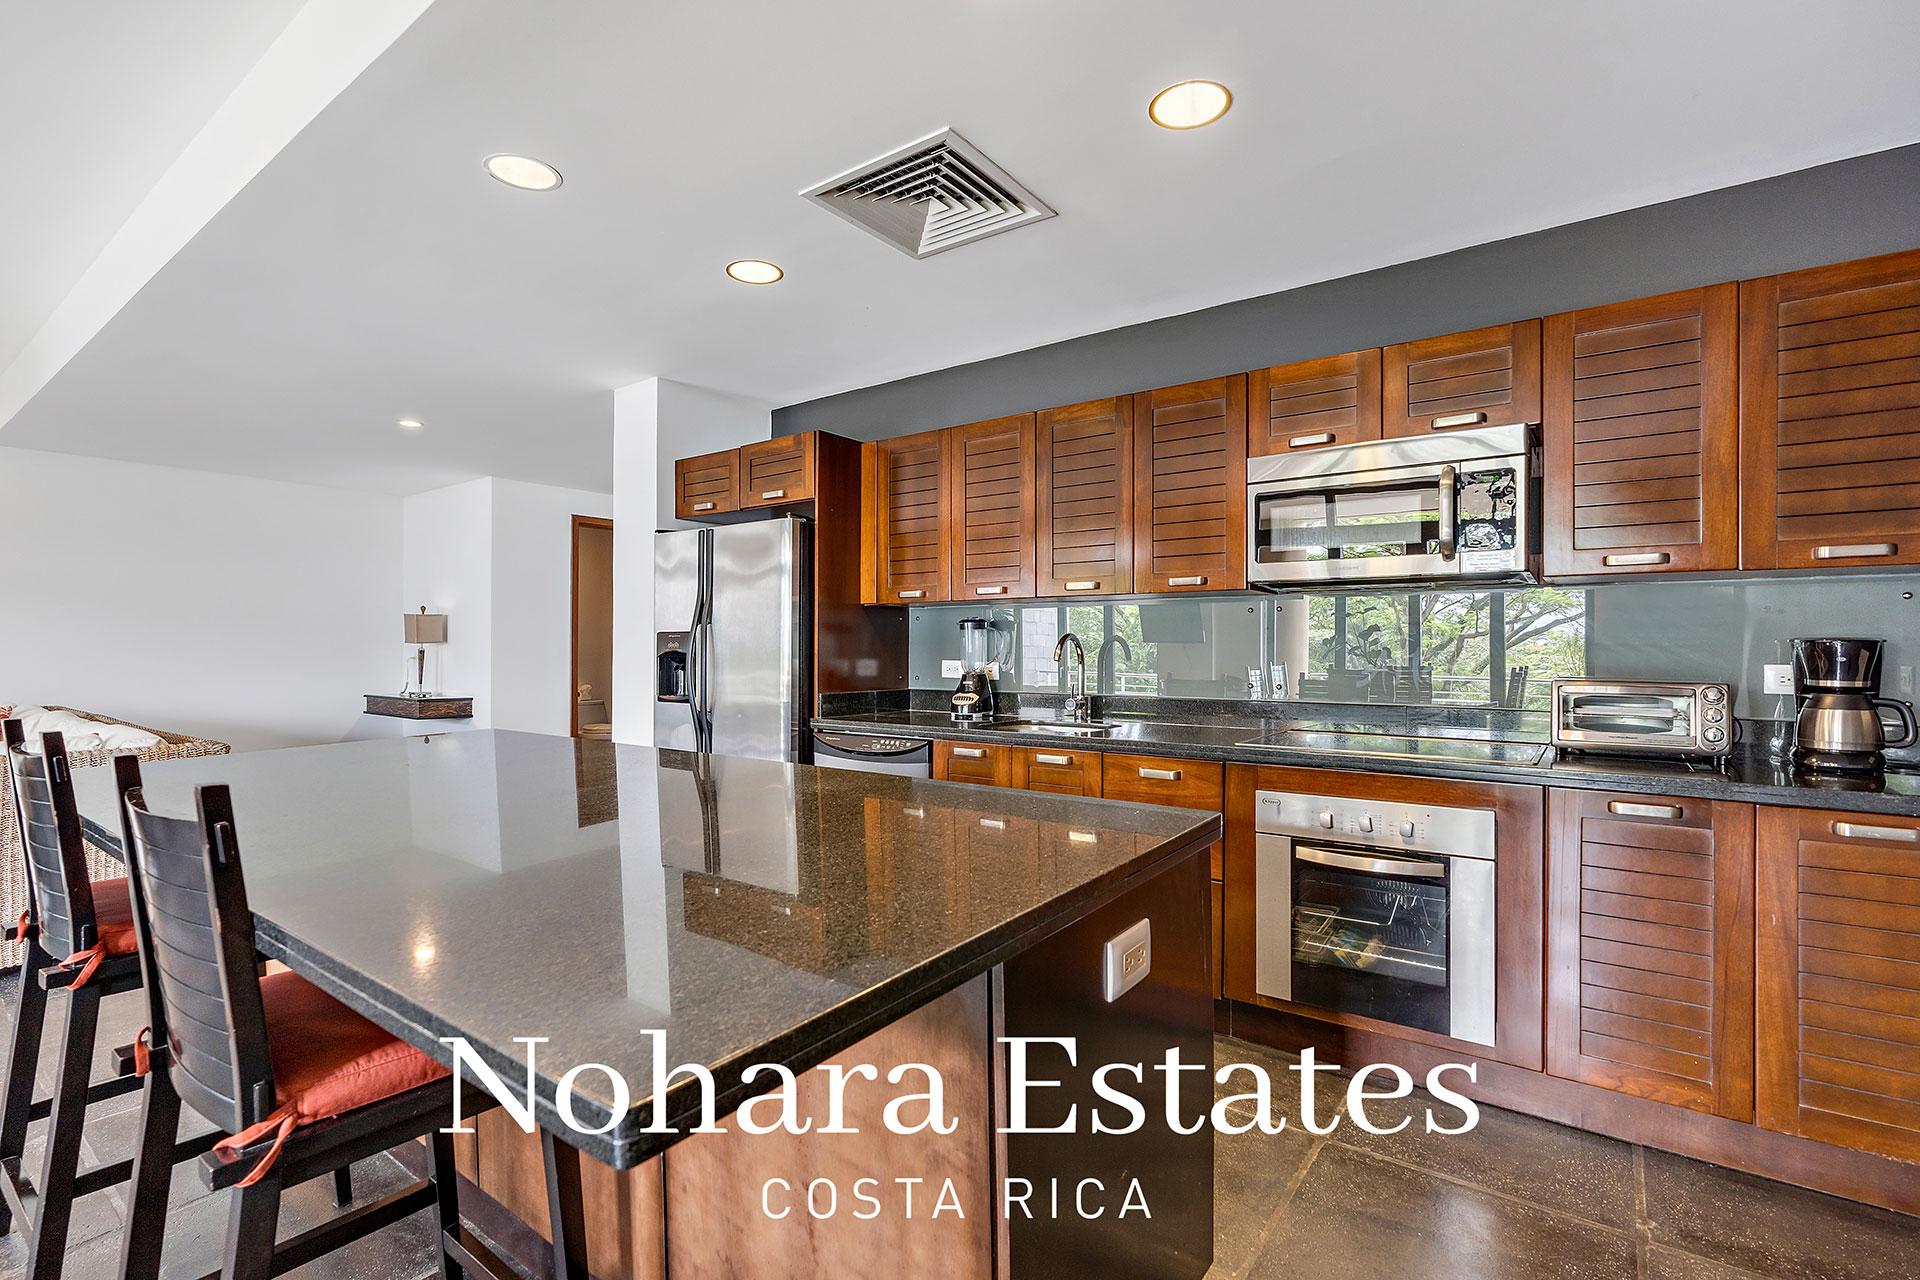 Nohara Estates Costa Rica 122 Apartment Quepos Los Altos 7